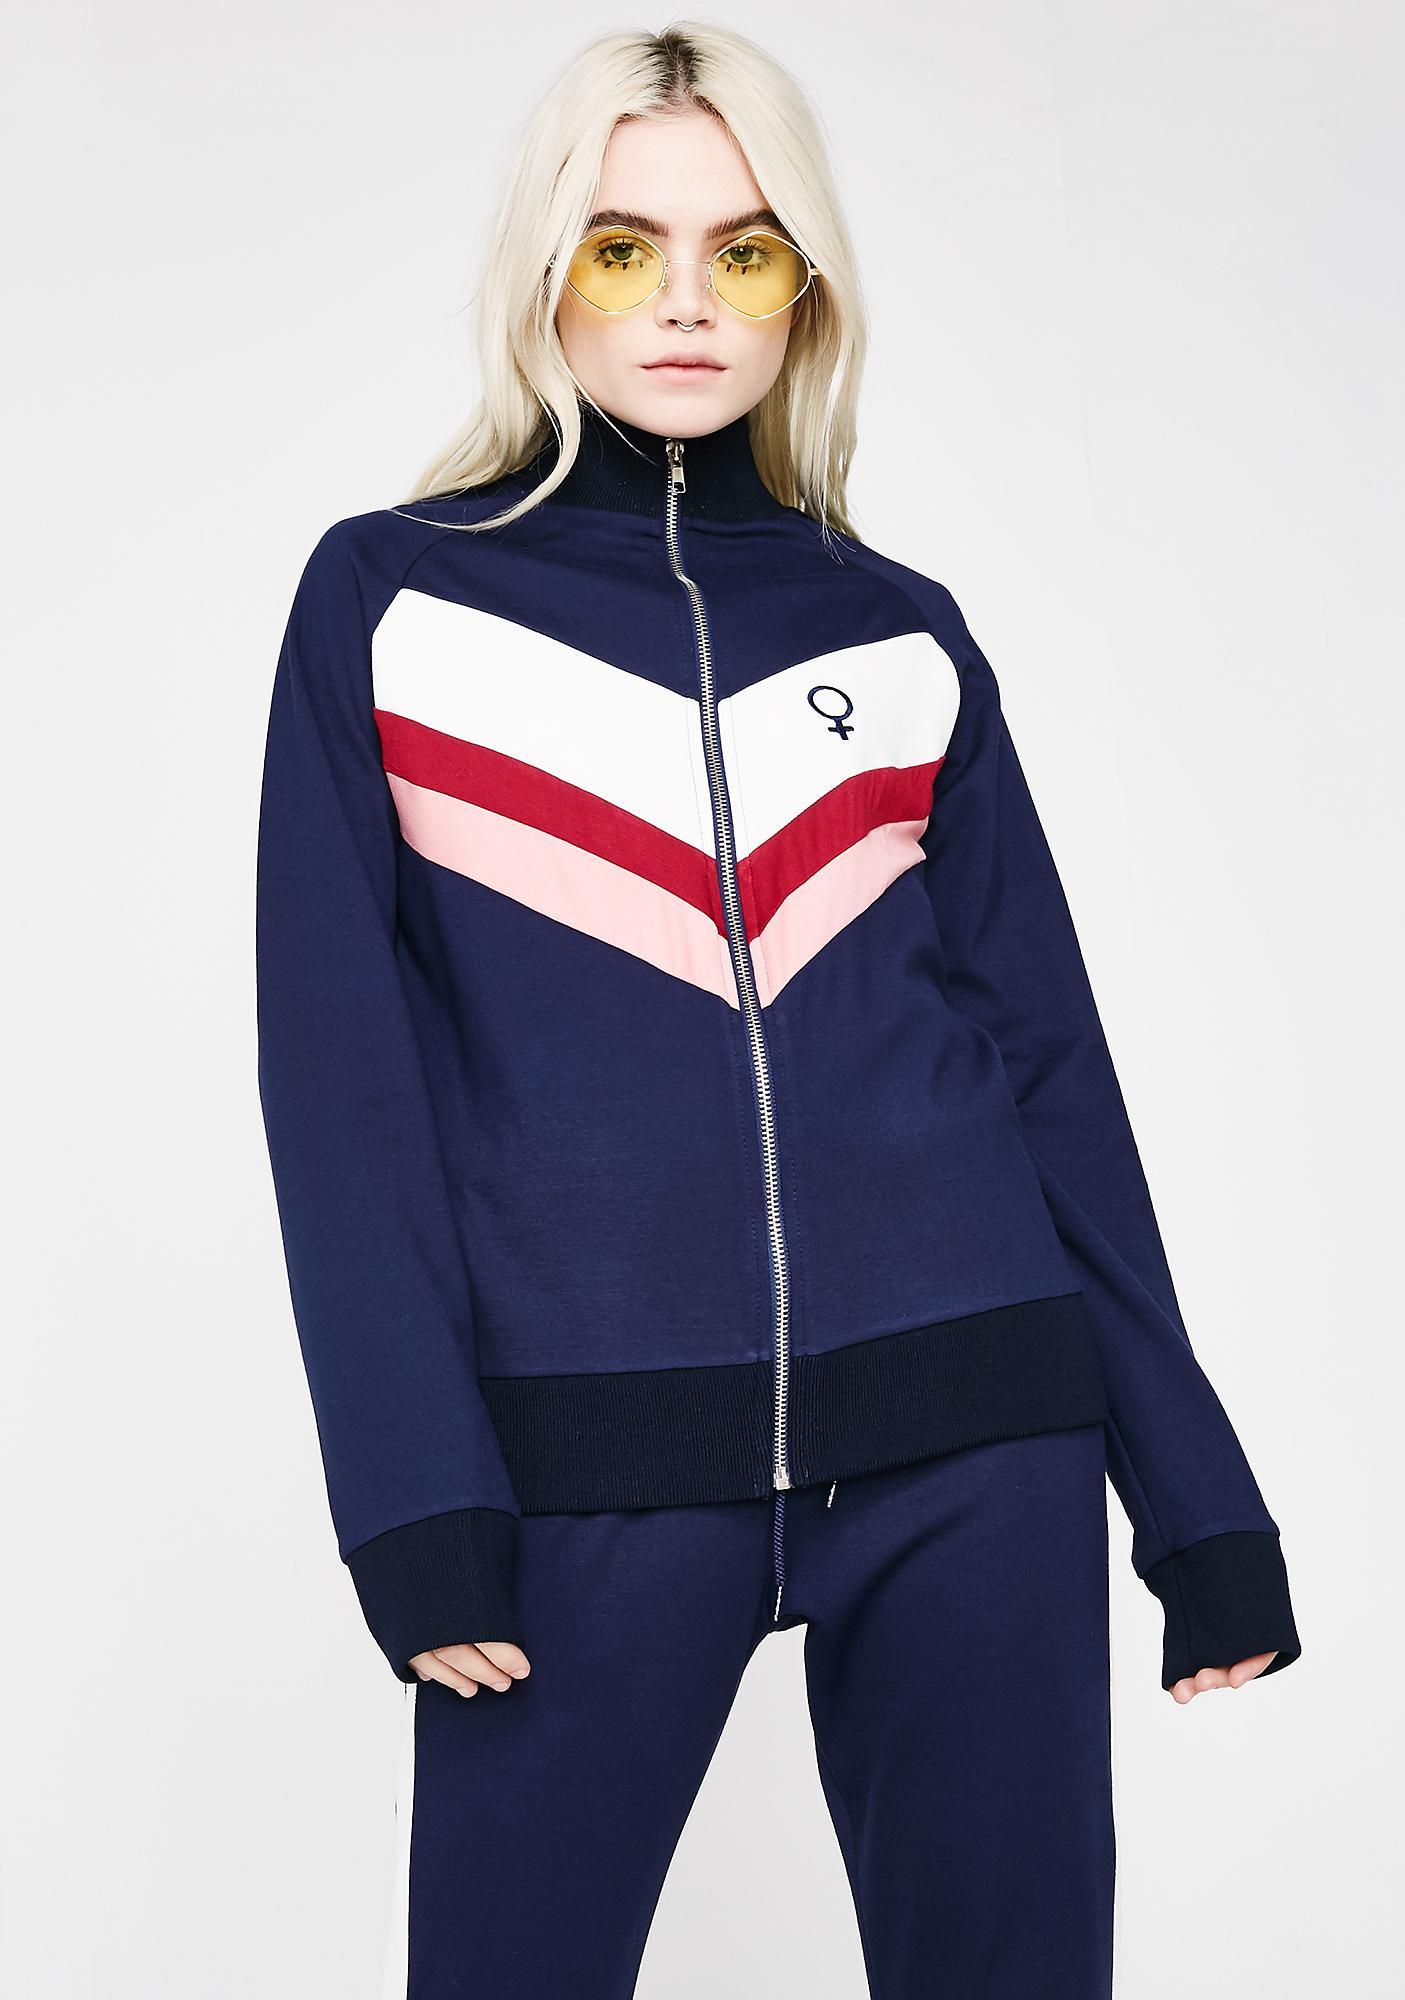 Valfré Femenino Track Suit